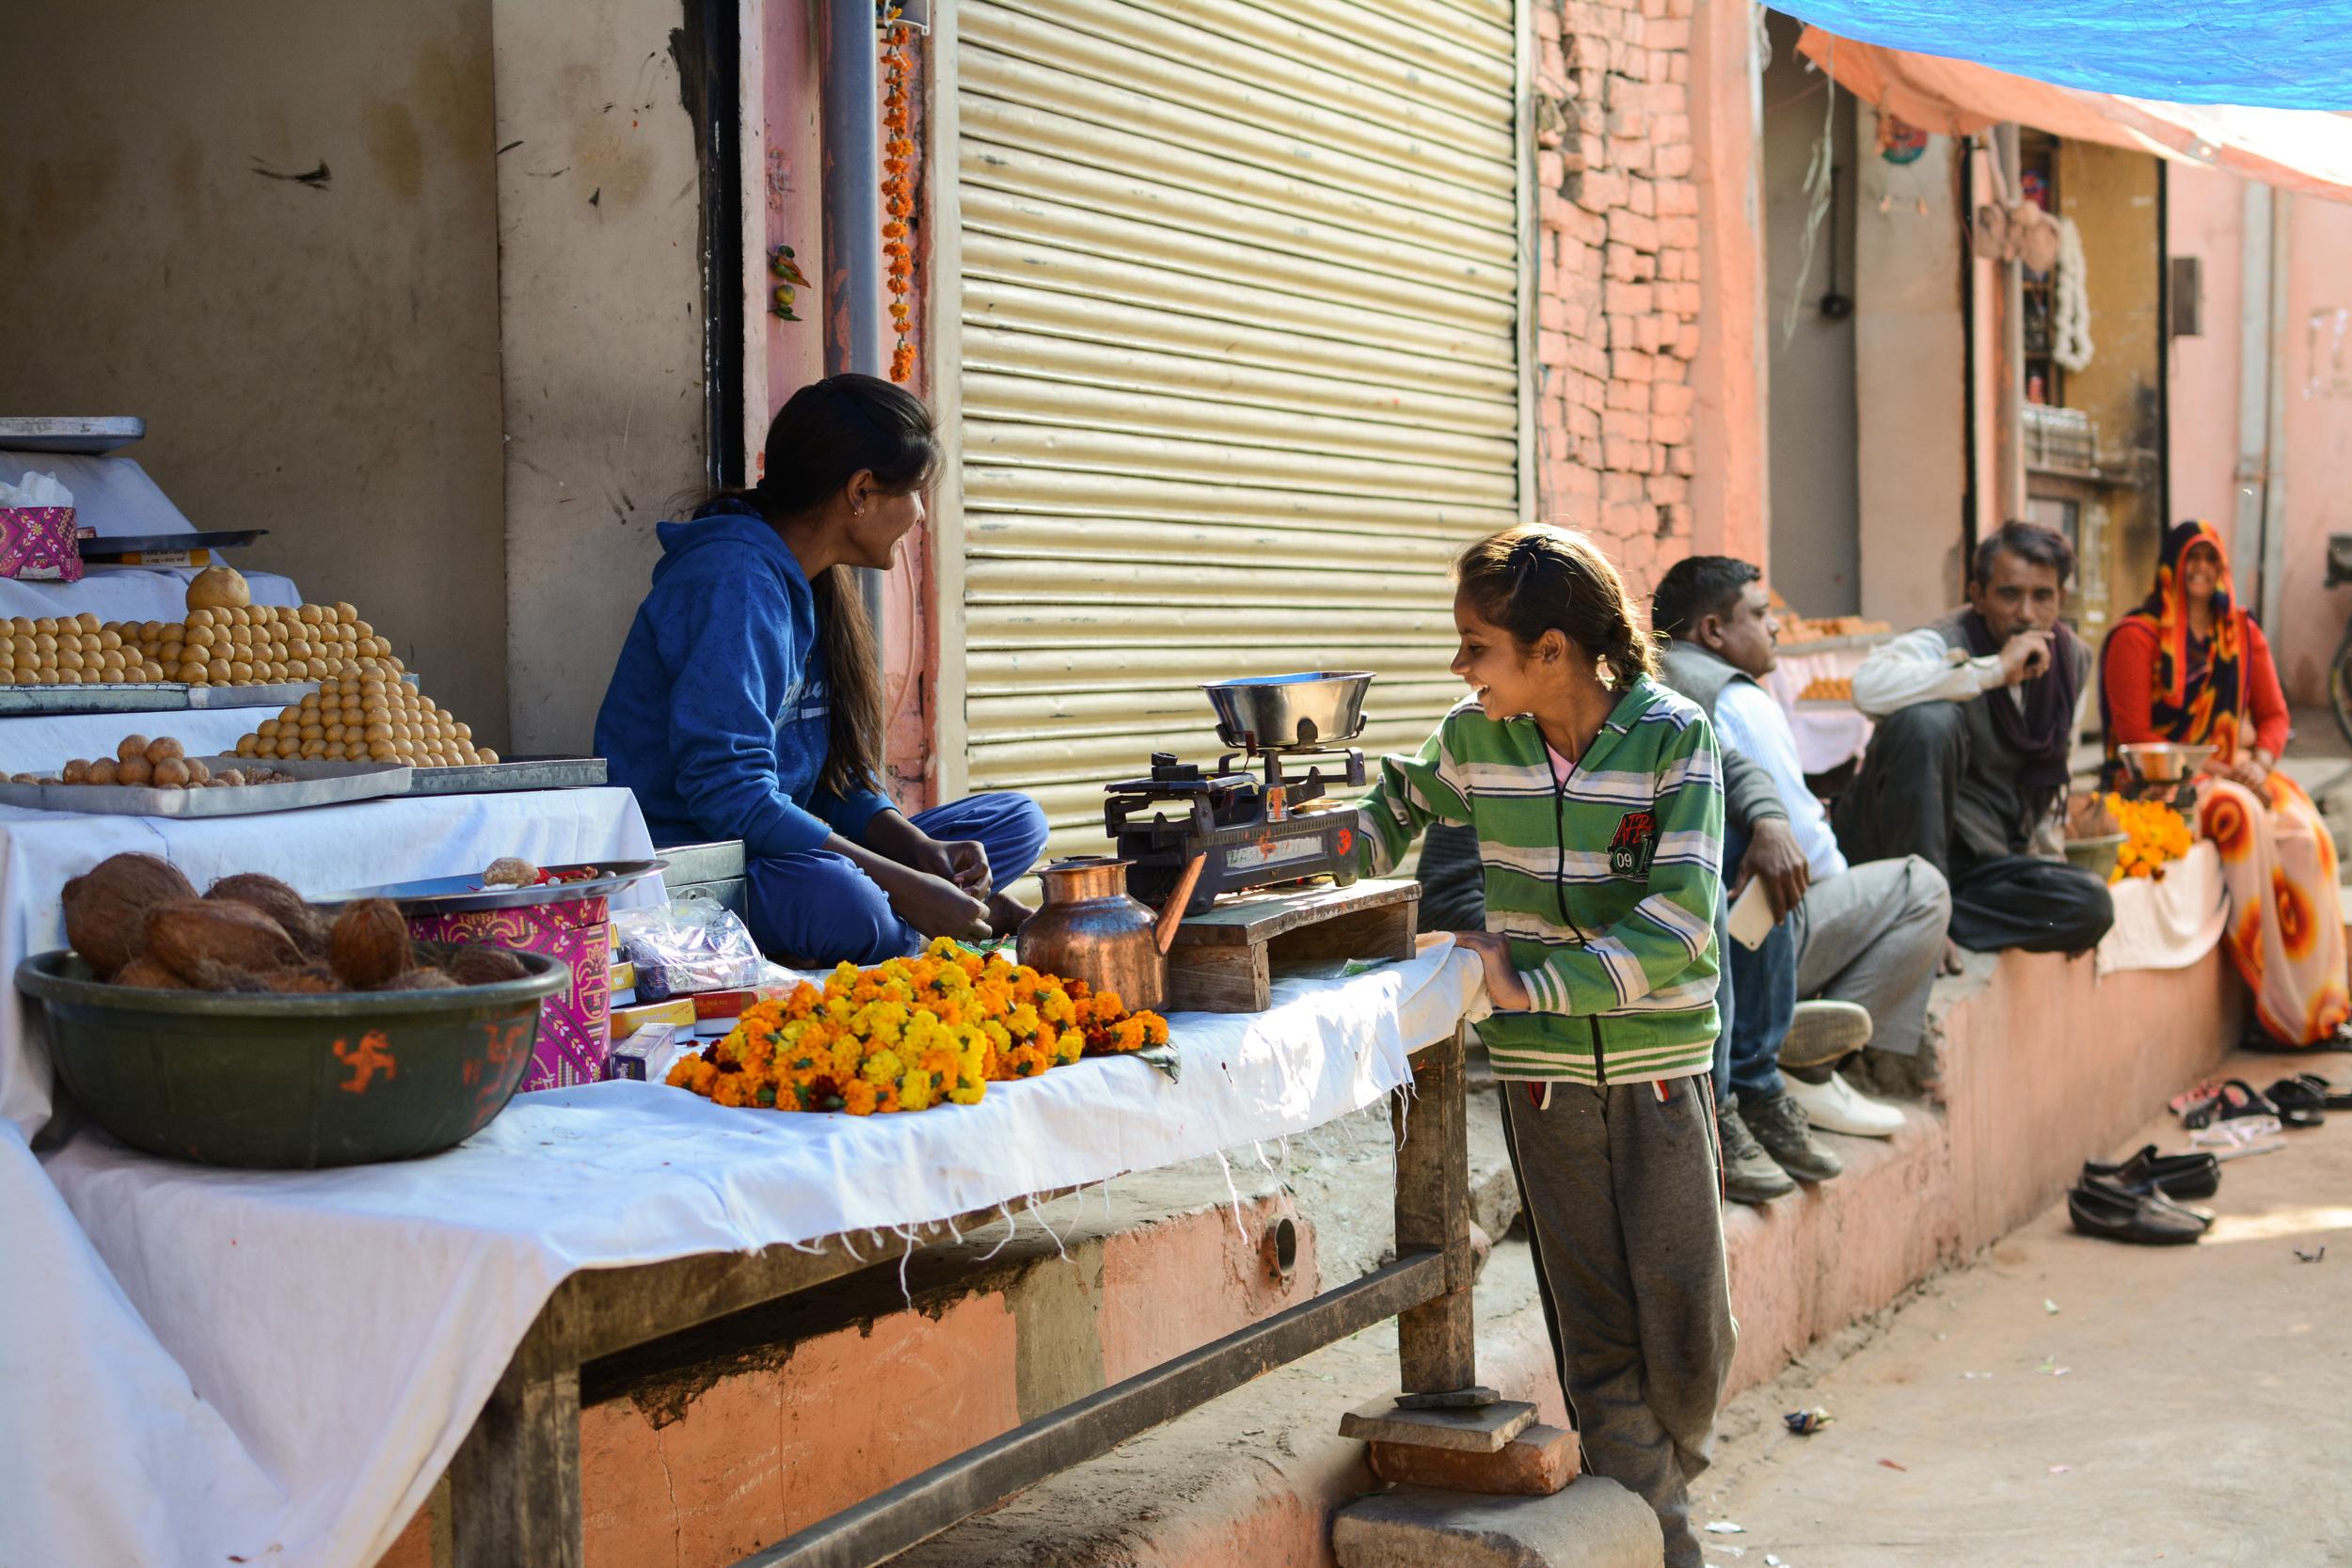 Jaipur, India  January 2016